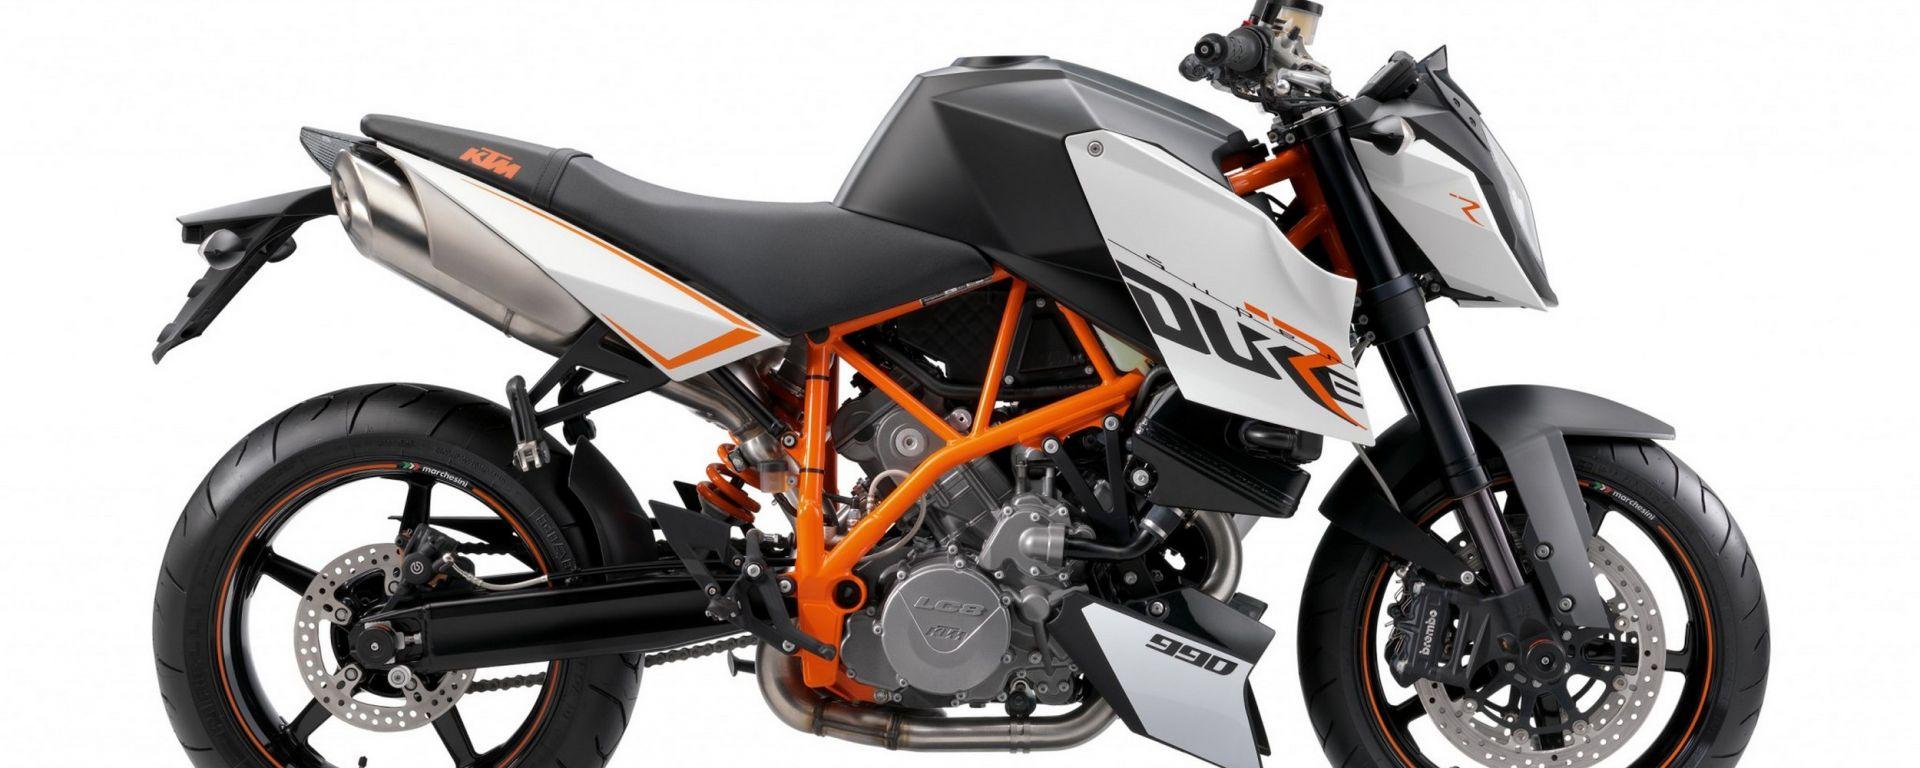 KTM Super Duke R 2012